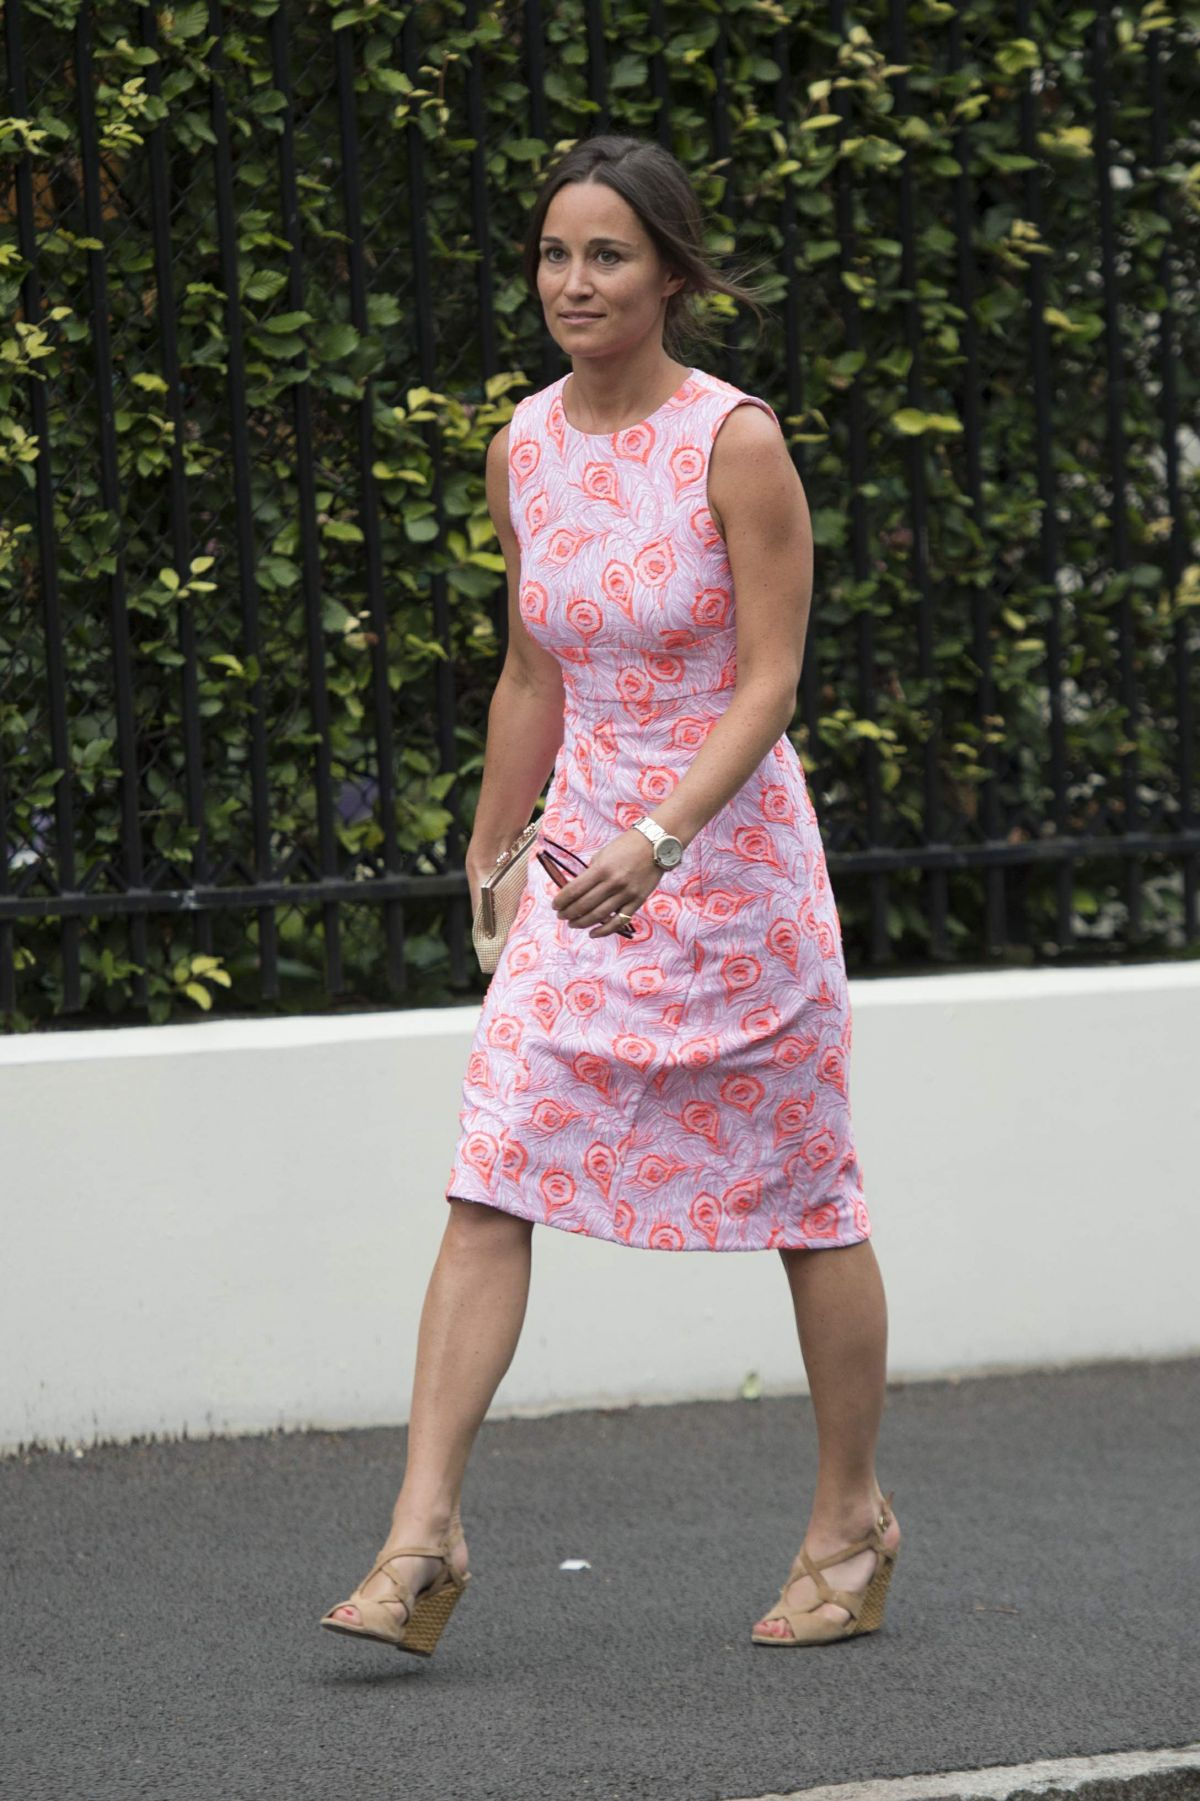 PIPPA MIDDLETON at Wimbledon Tennis Championships in London 07/06/2016